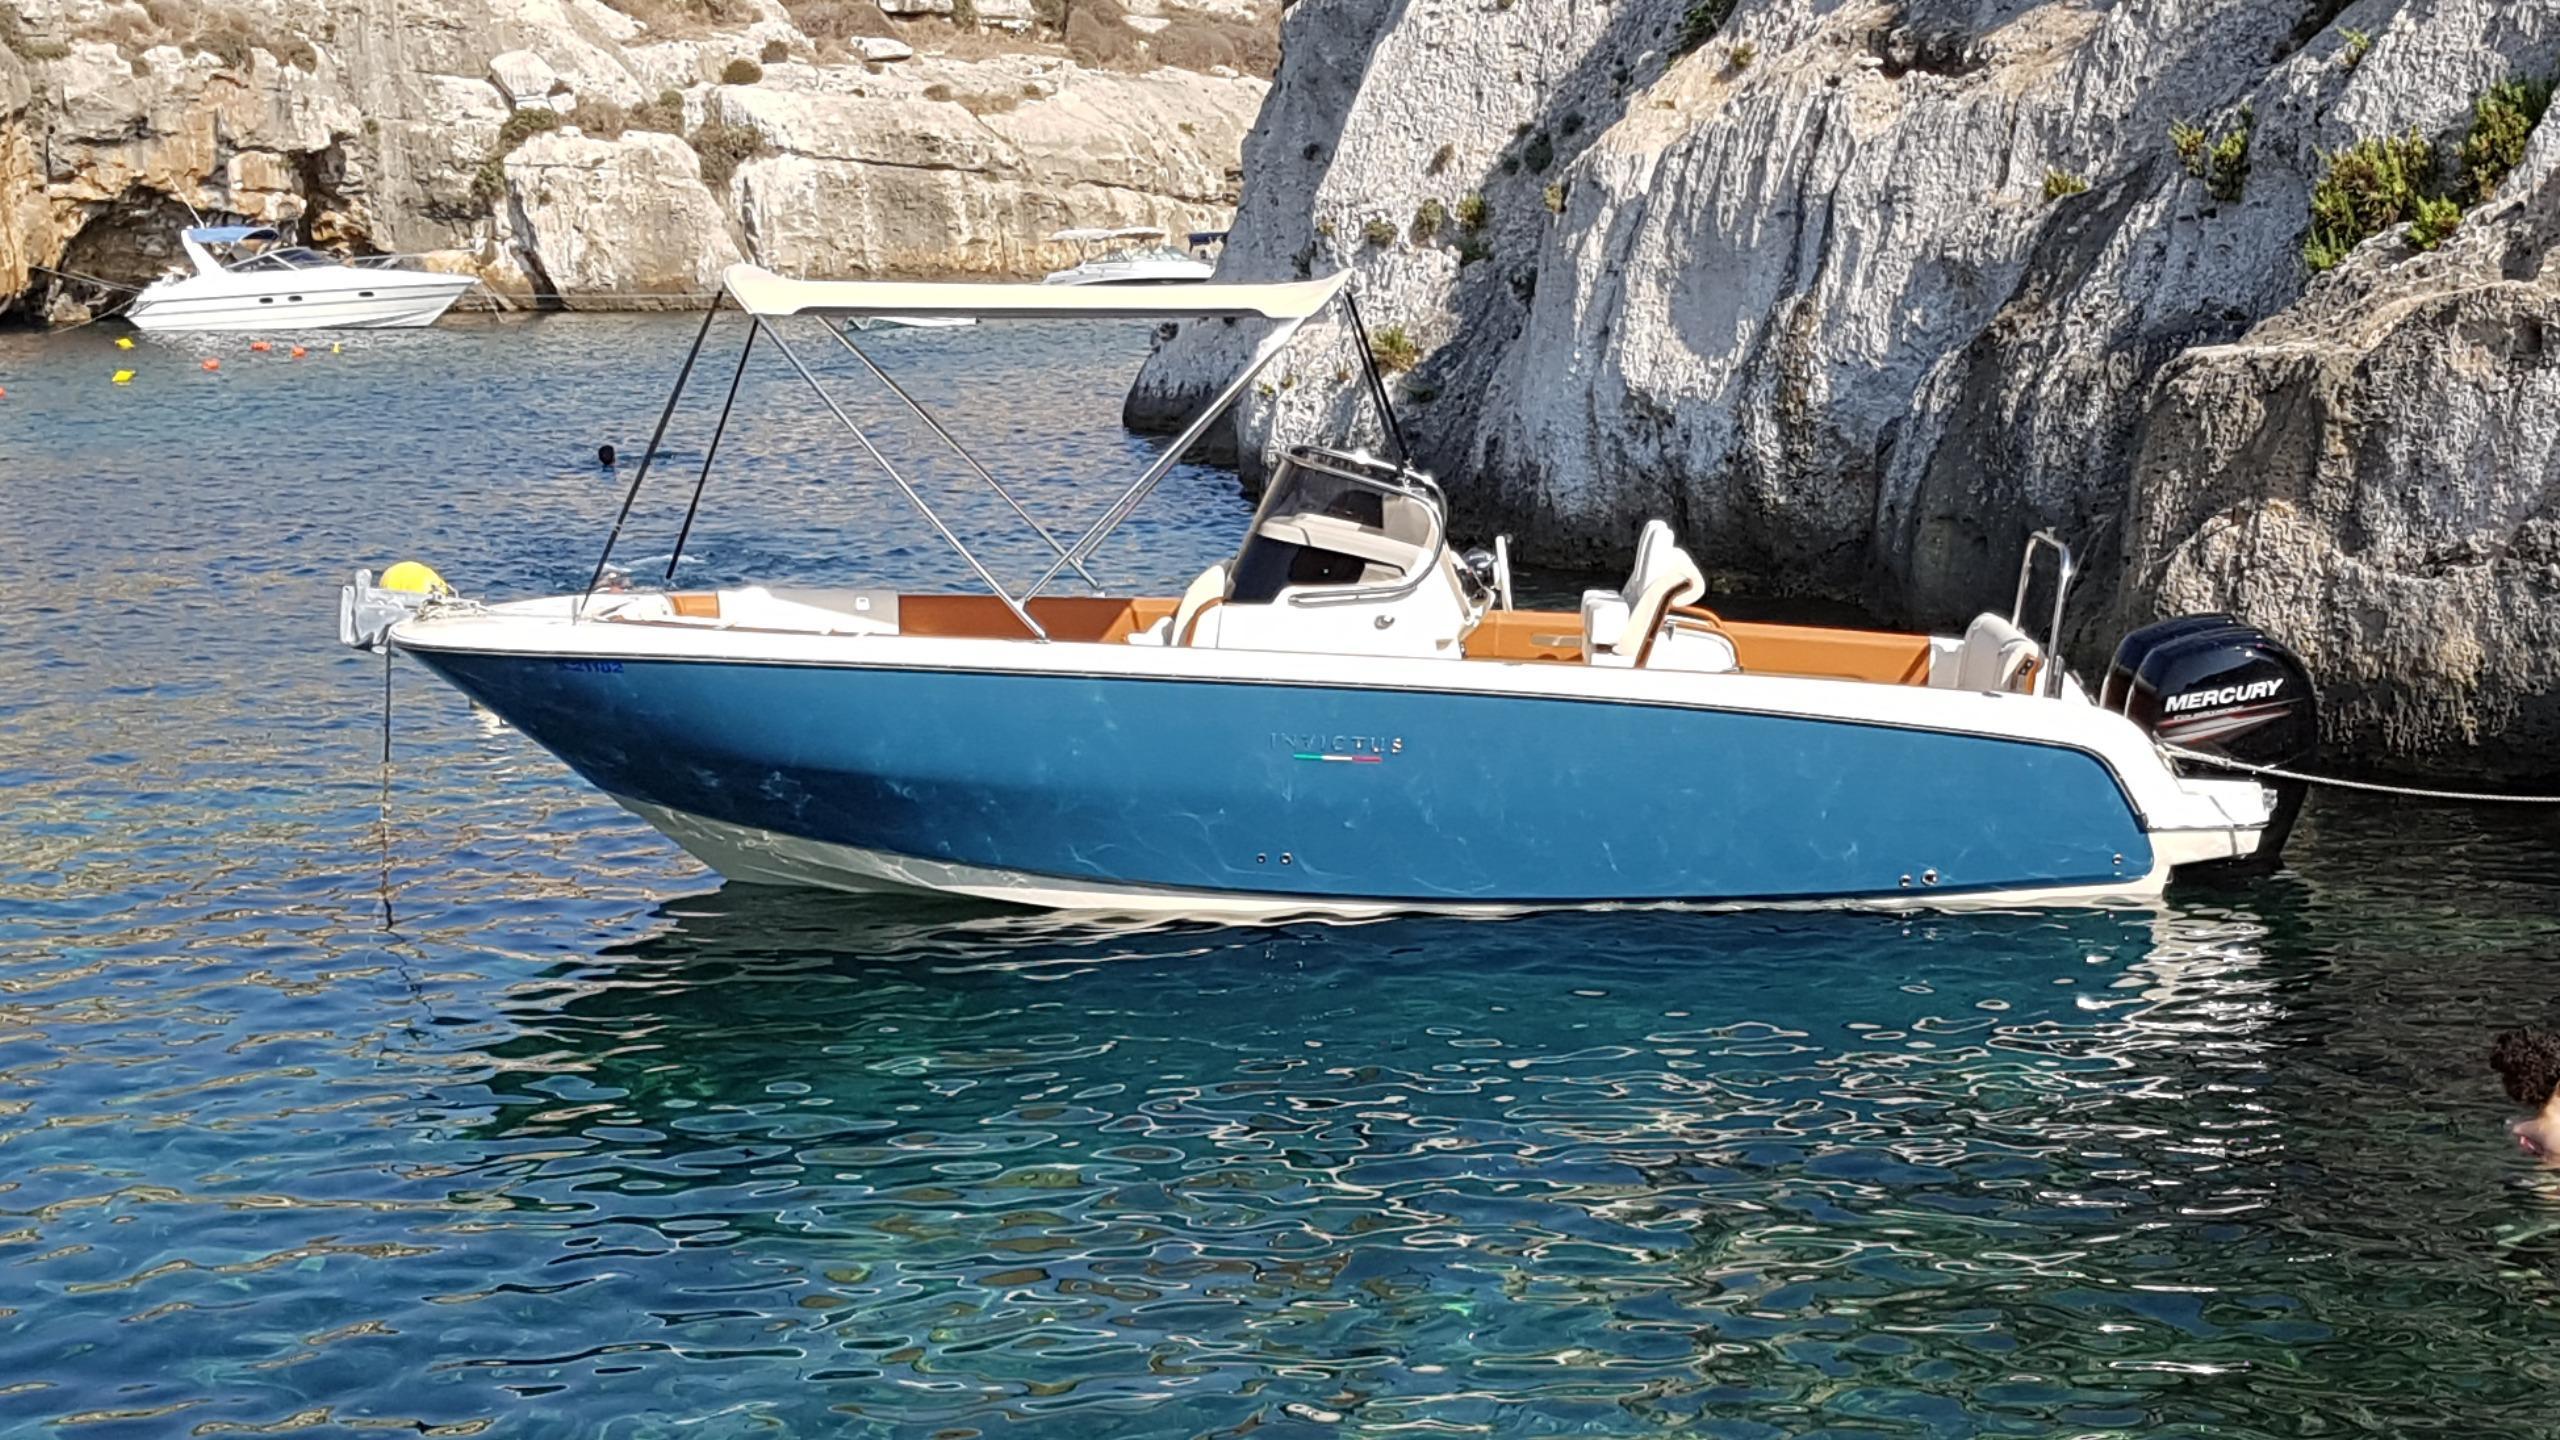 2016 Invictus 270FX Power Boat For Sale Wwwyachtworldcom